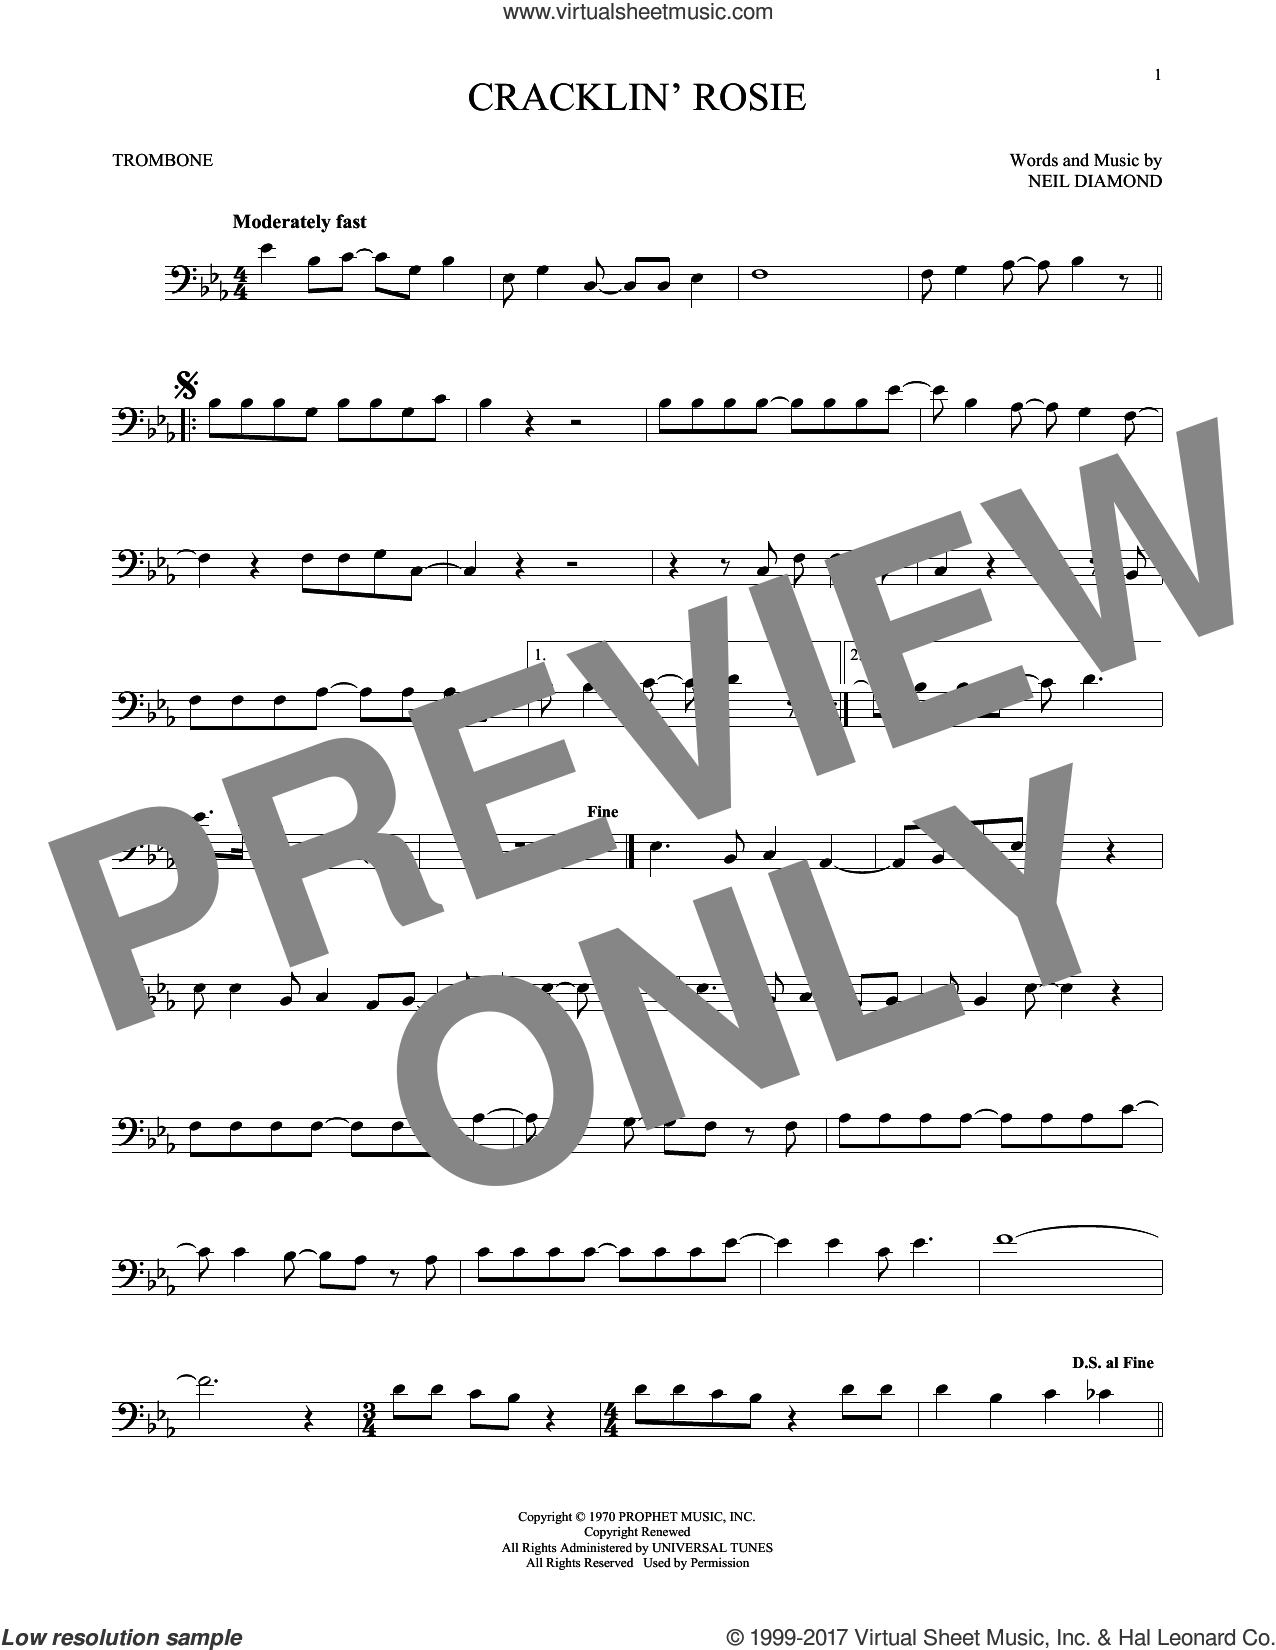 Cracklin' Rosie sheet music for trombone solo by Neil Diamond, intermediate skill level